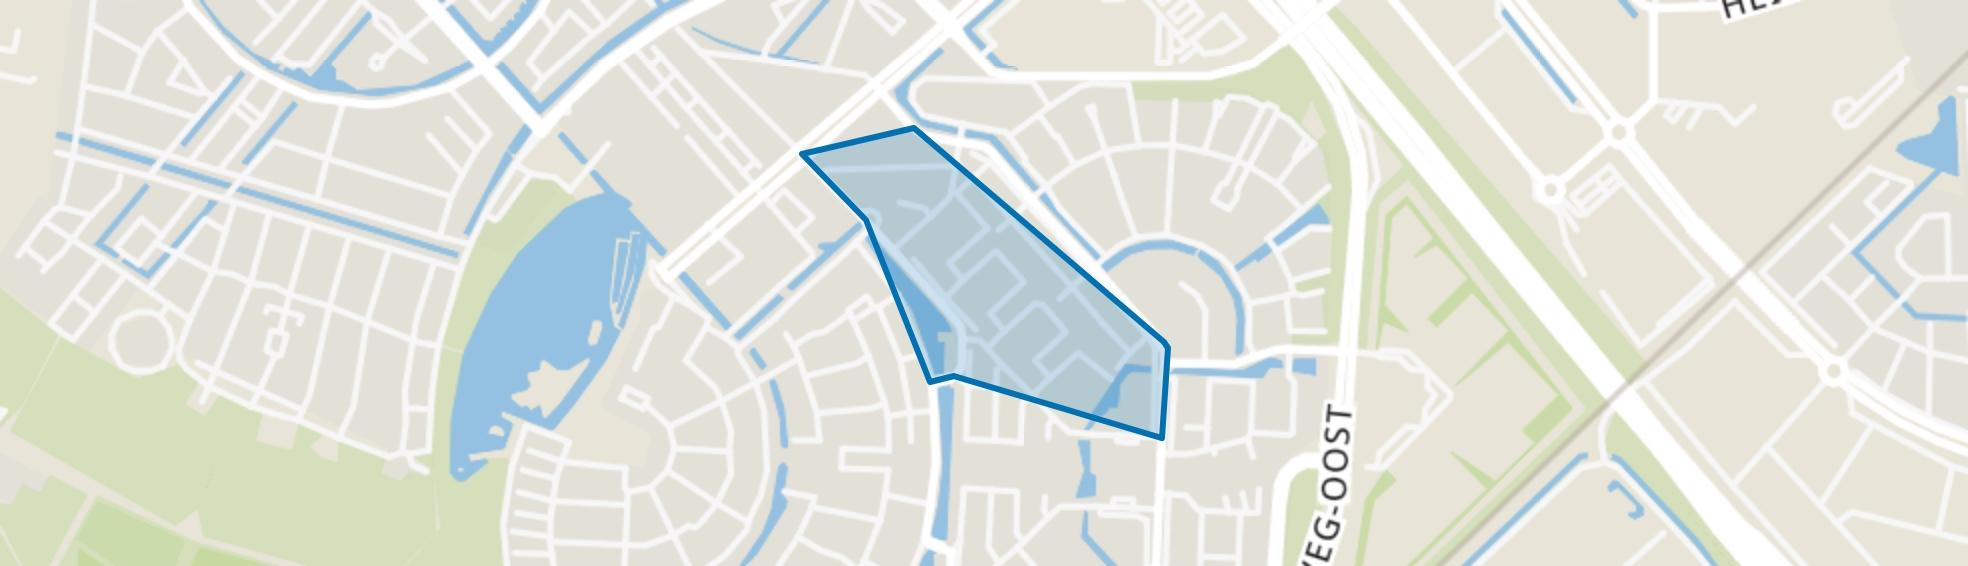 Muziekbuurt-Noord, Amersfoort map